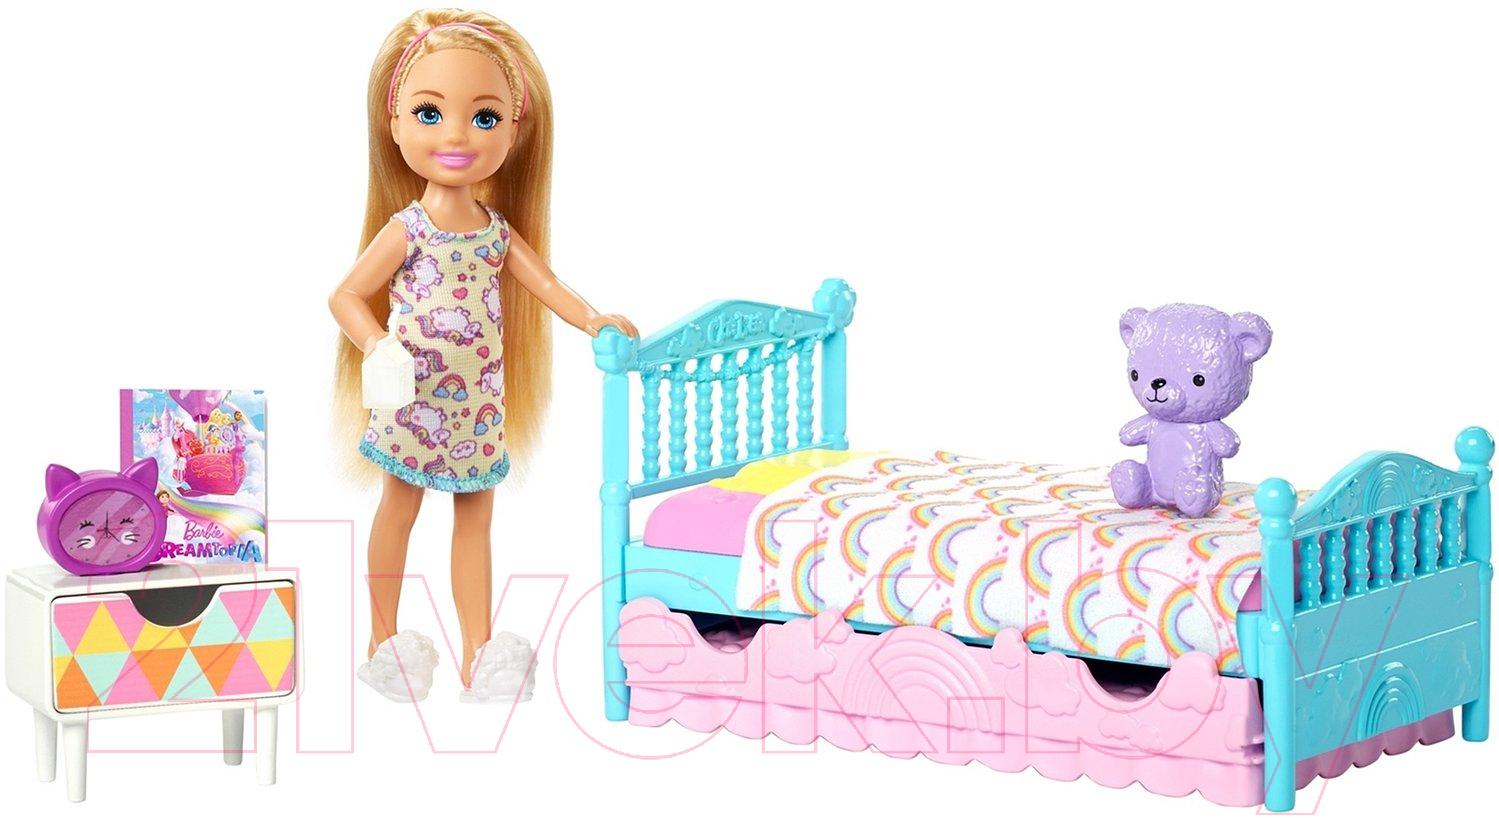 Купить Кукла с аксессуарами Barbie, Челси и зверушка / FDB32/FXG83, Китай, пластик